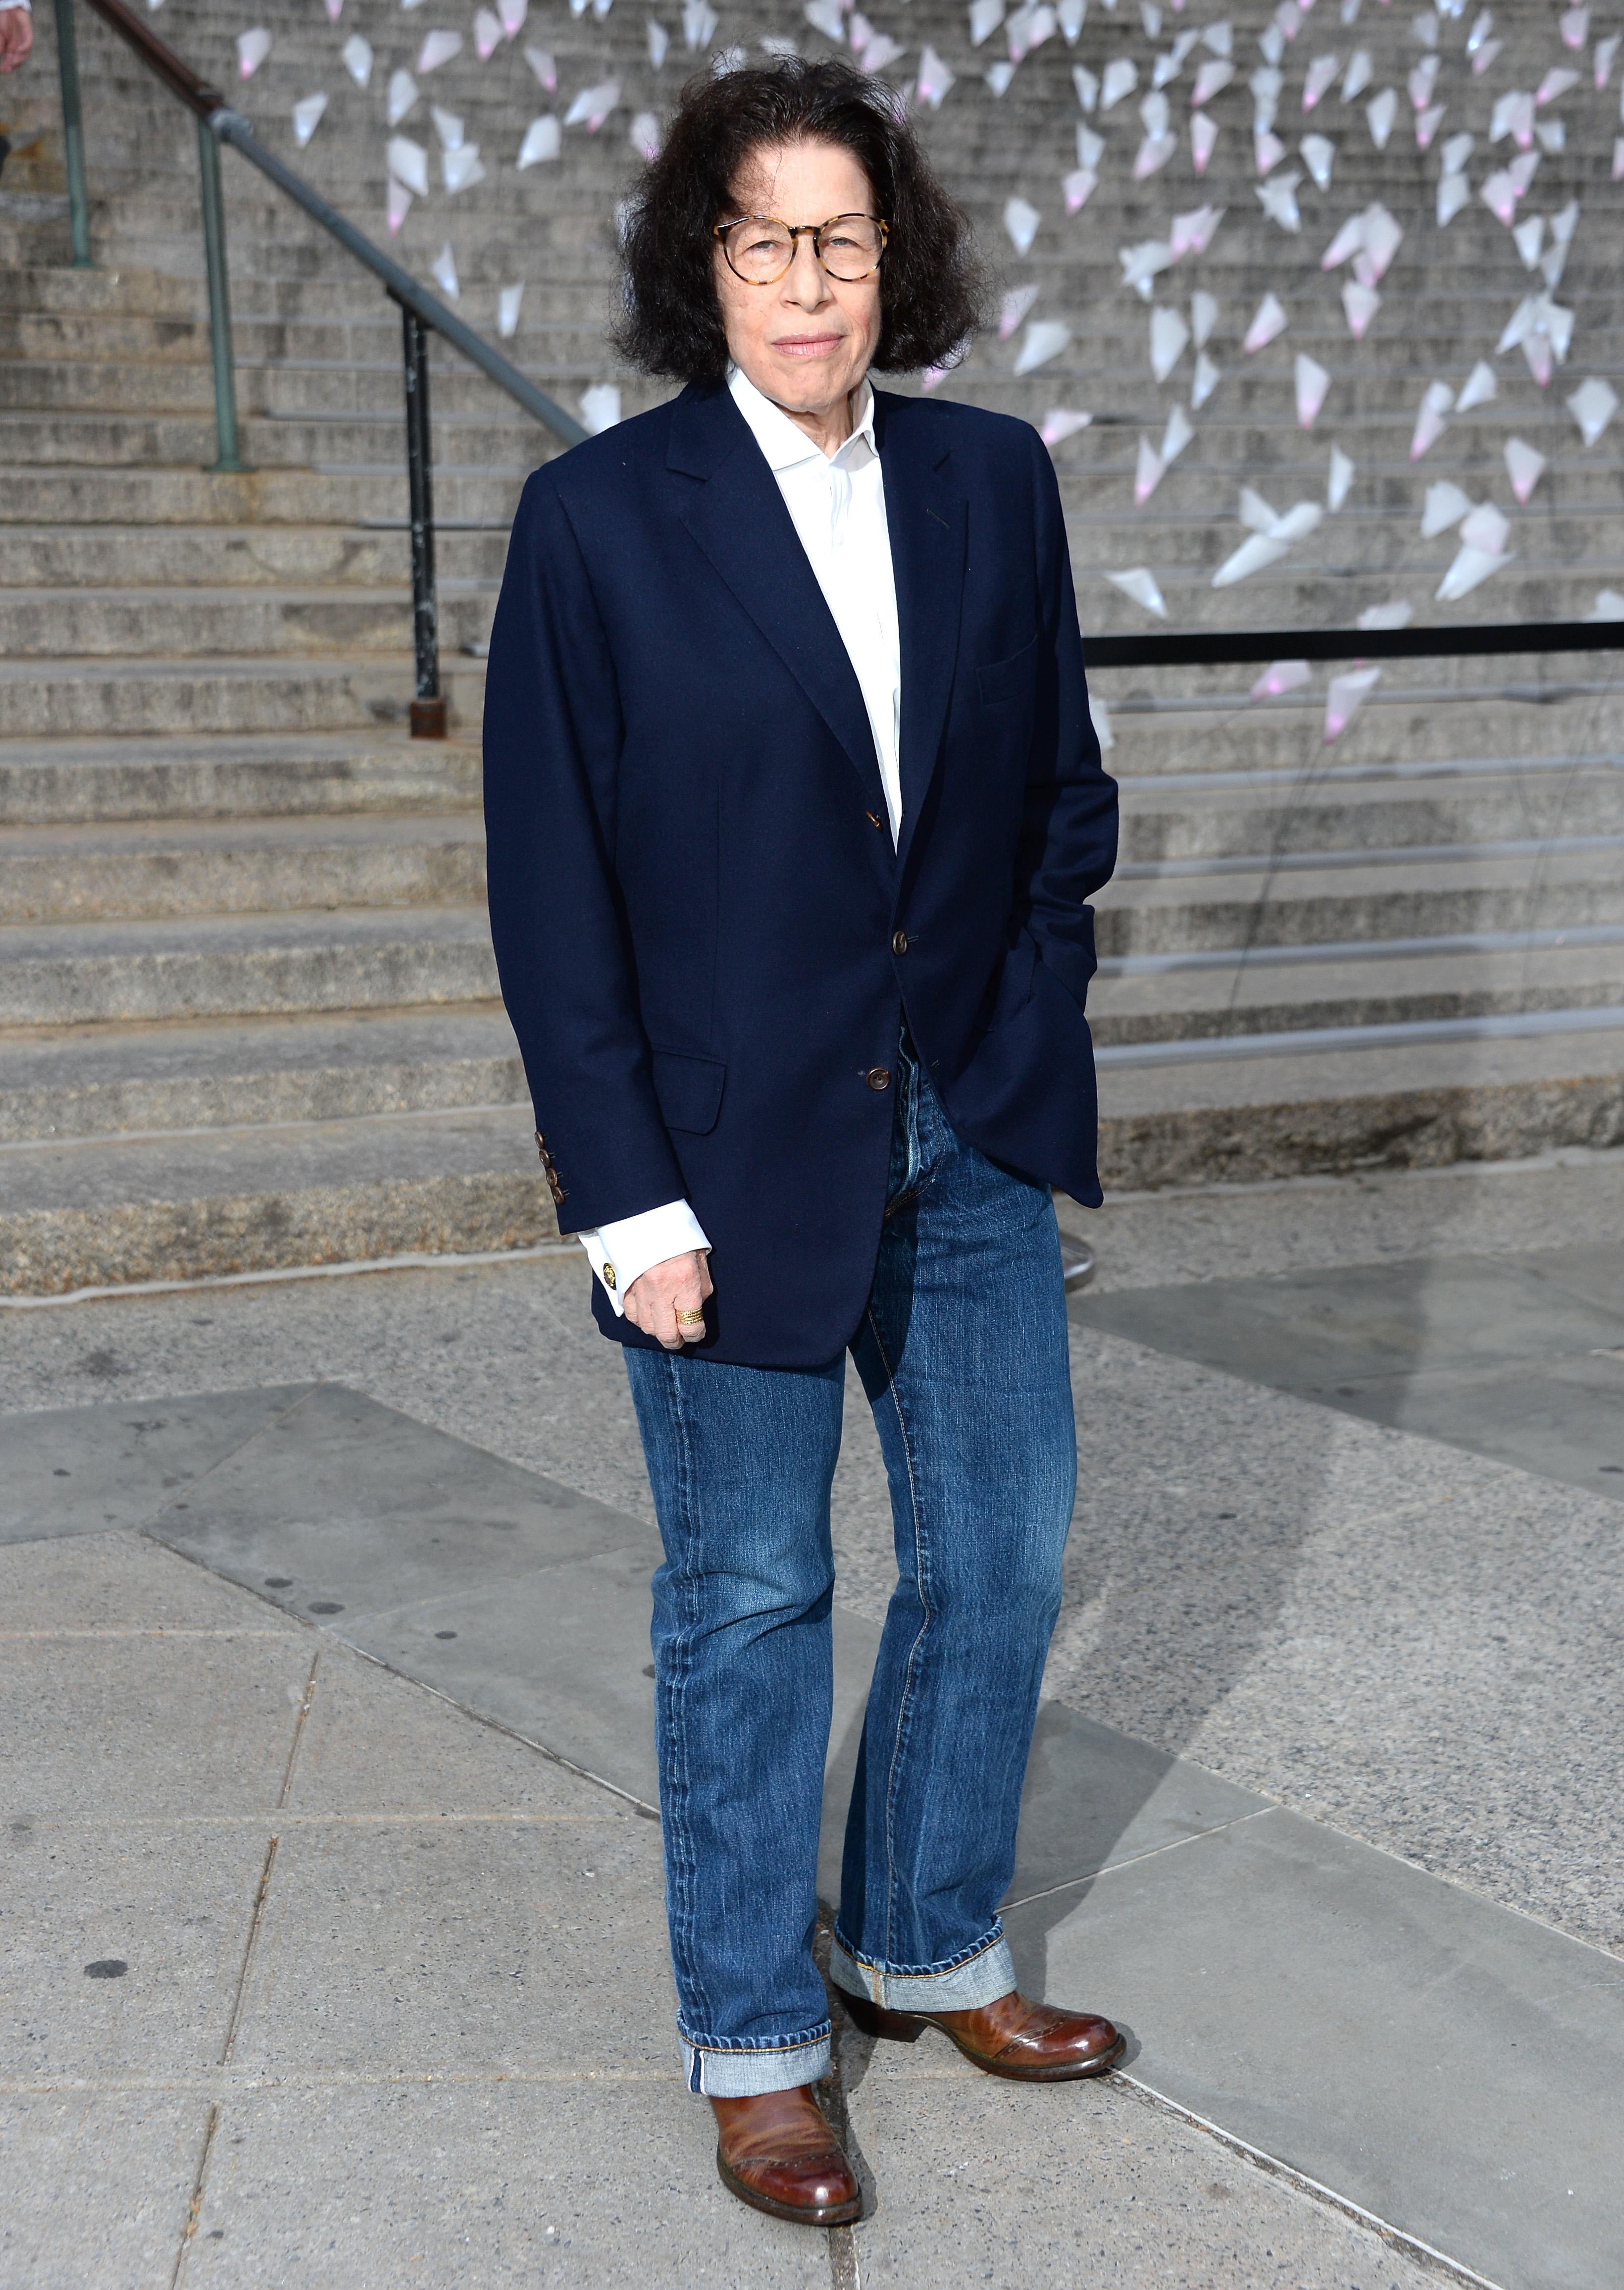 Fran Lebowitz And The Fashion Uniform